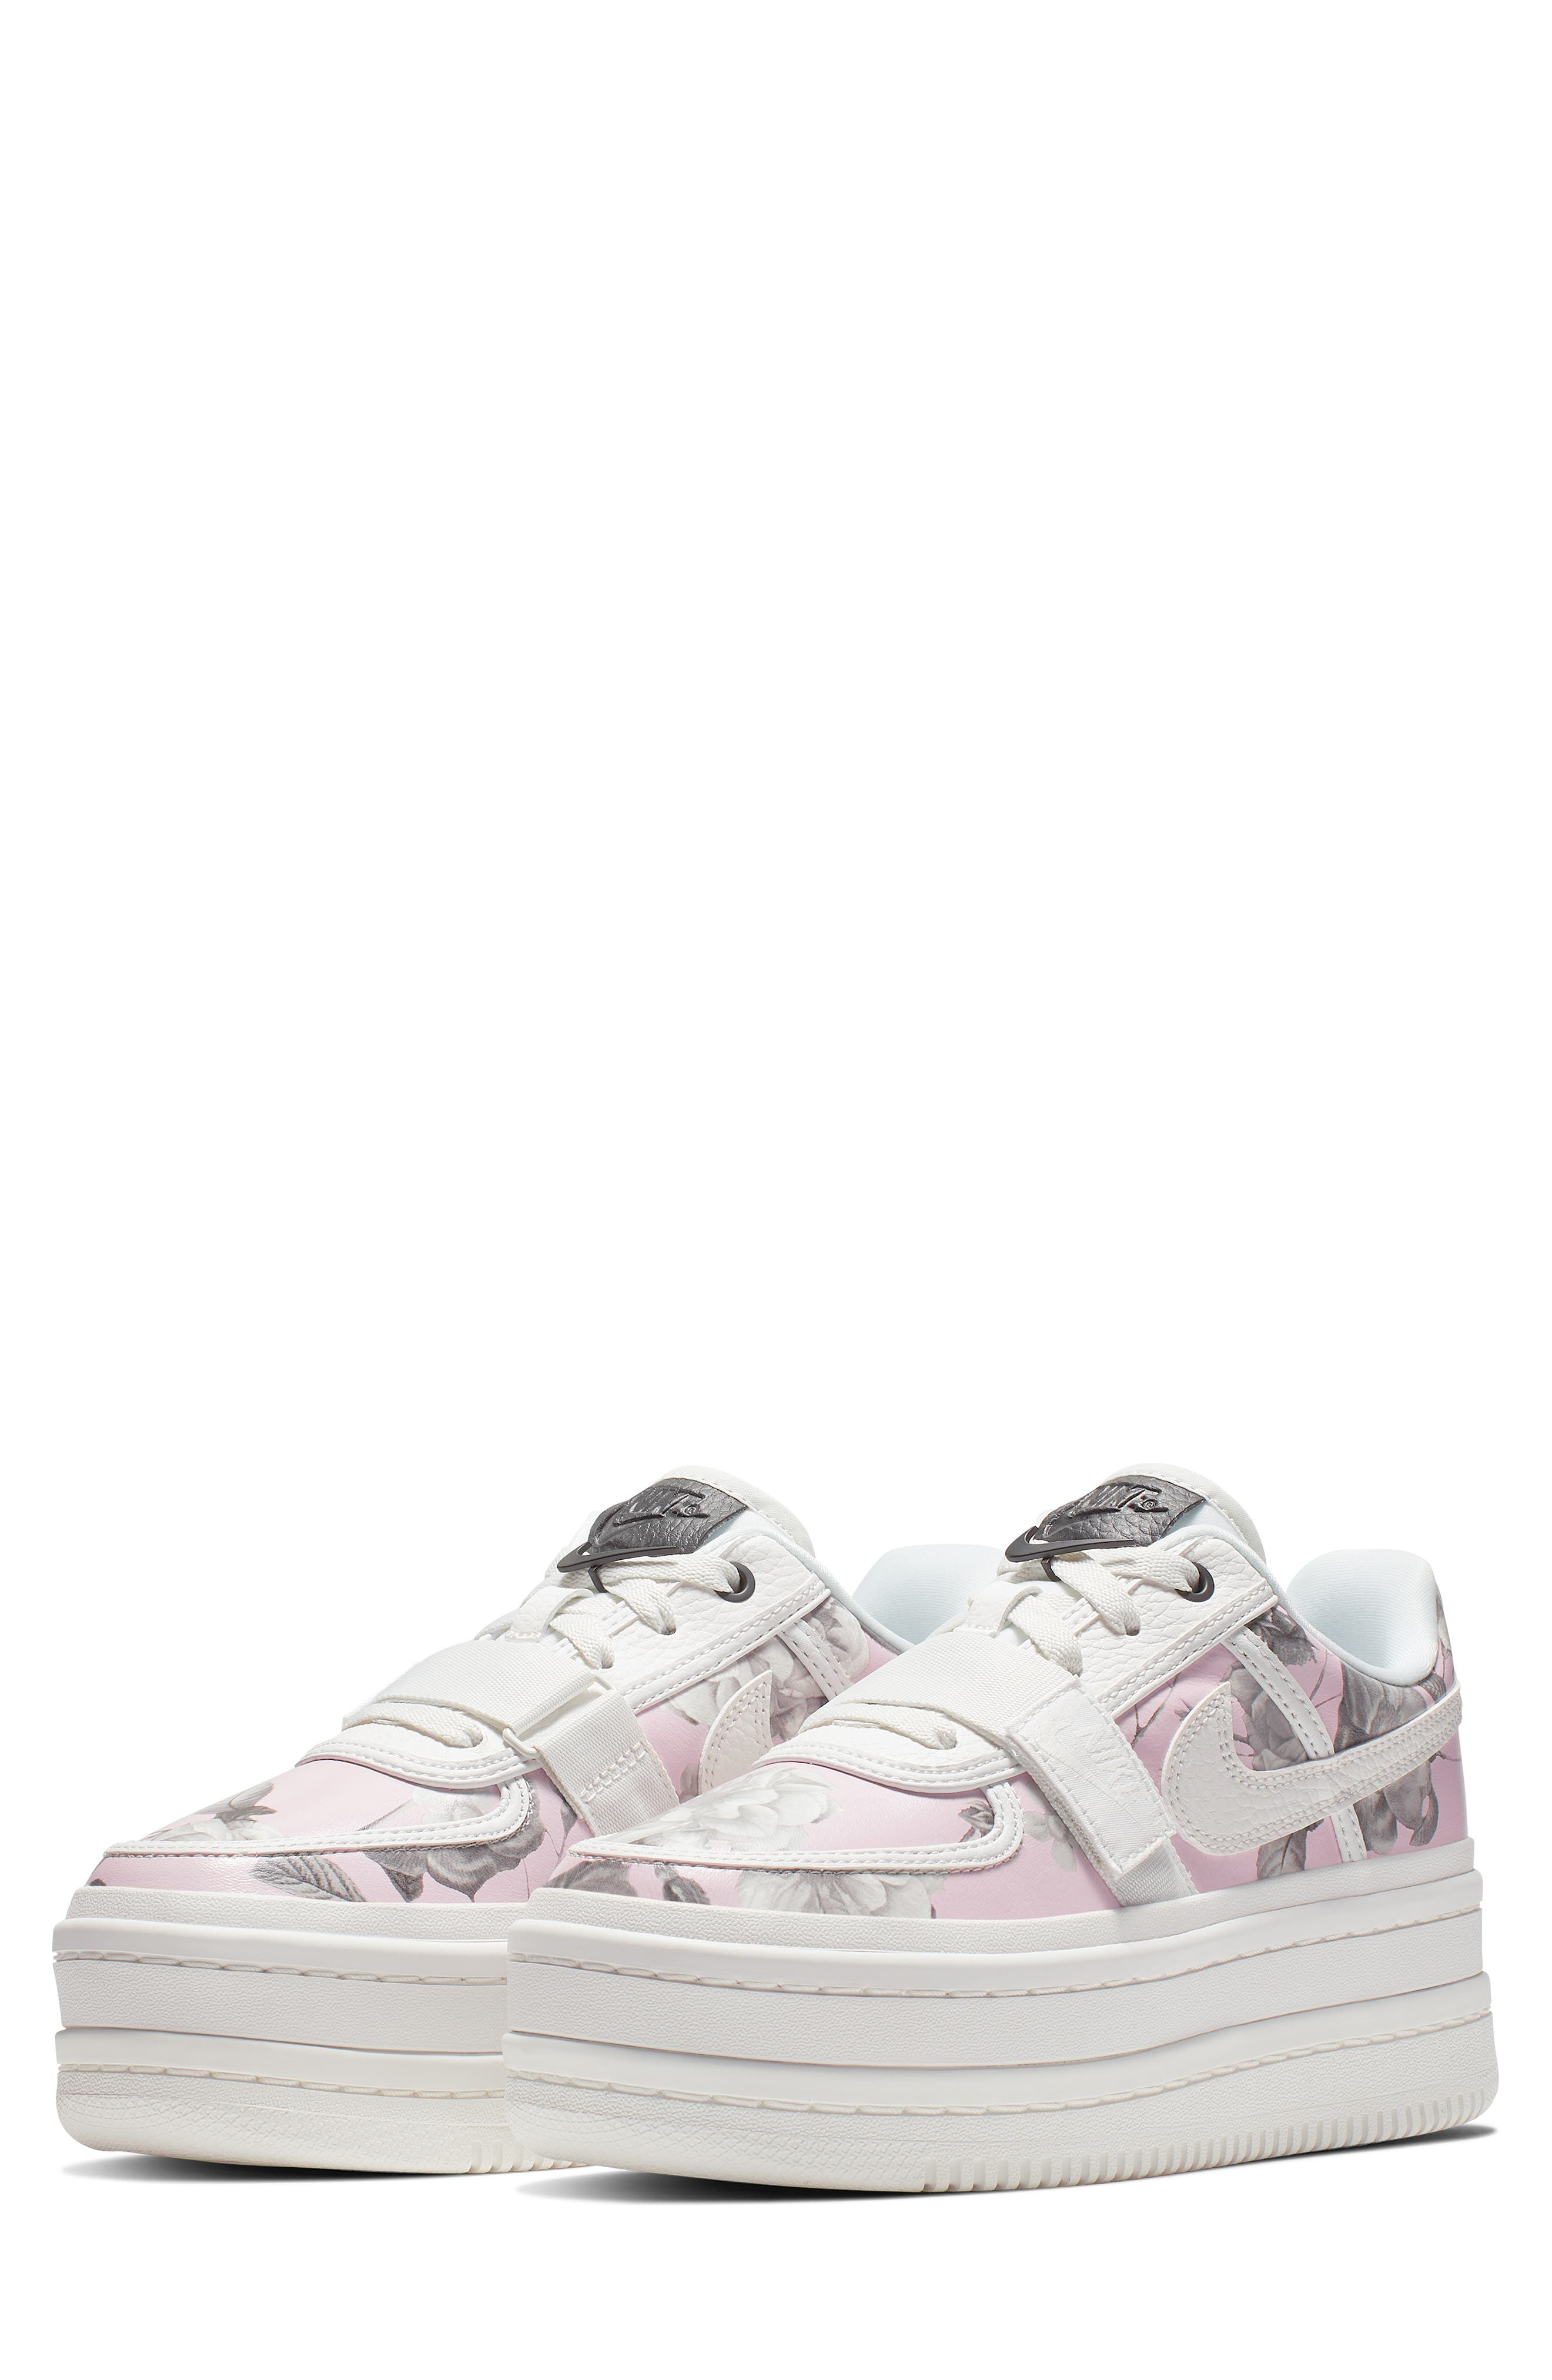 NIKE Vandal 2K LX Platform Sneaker, Main, color, WHITE/ WHITE/ BLACK